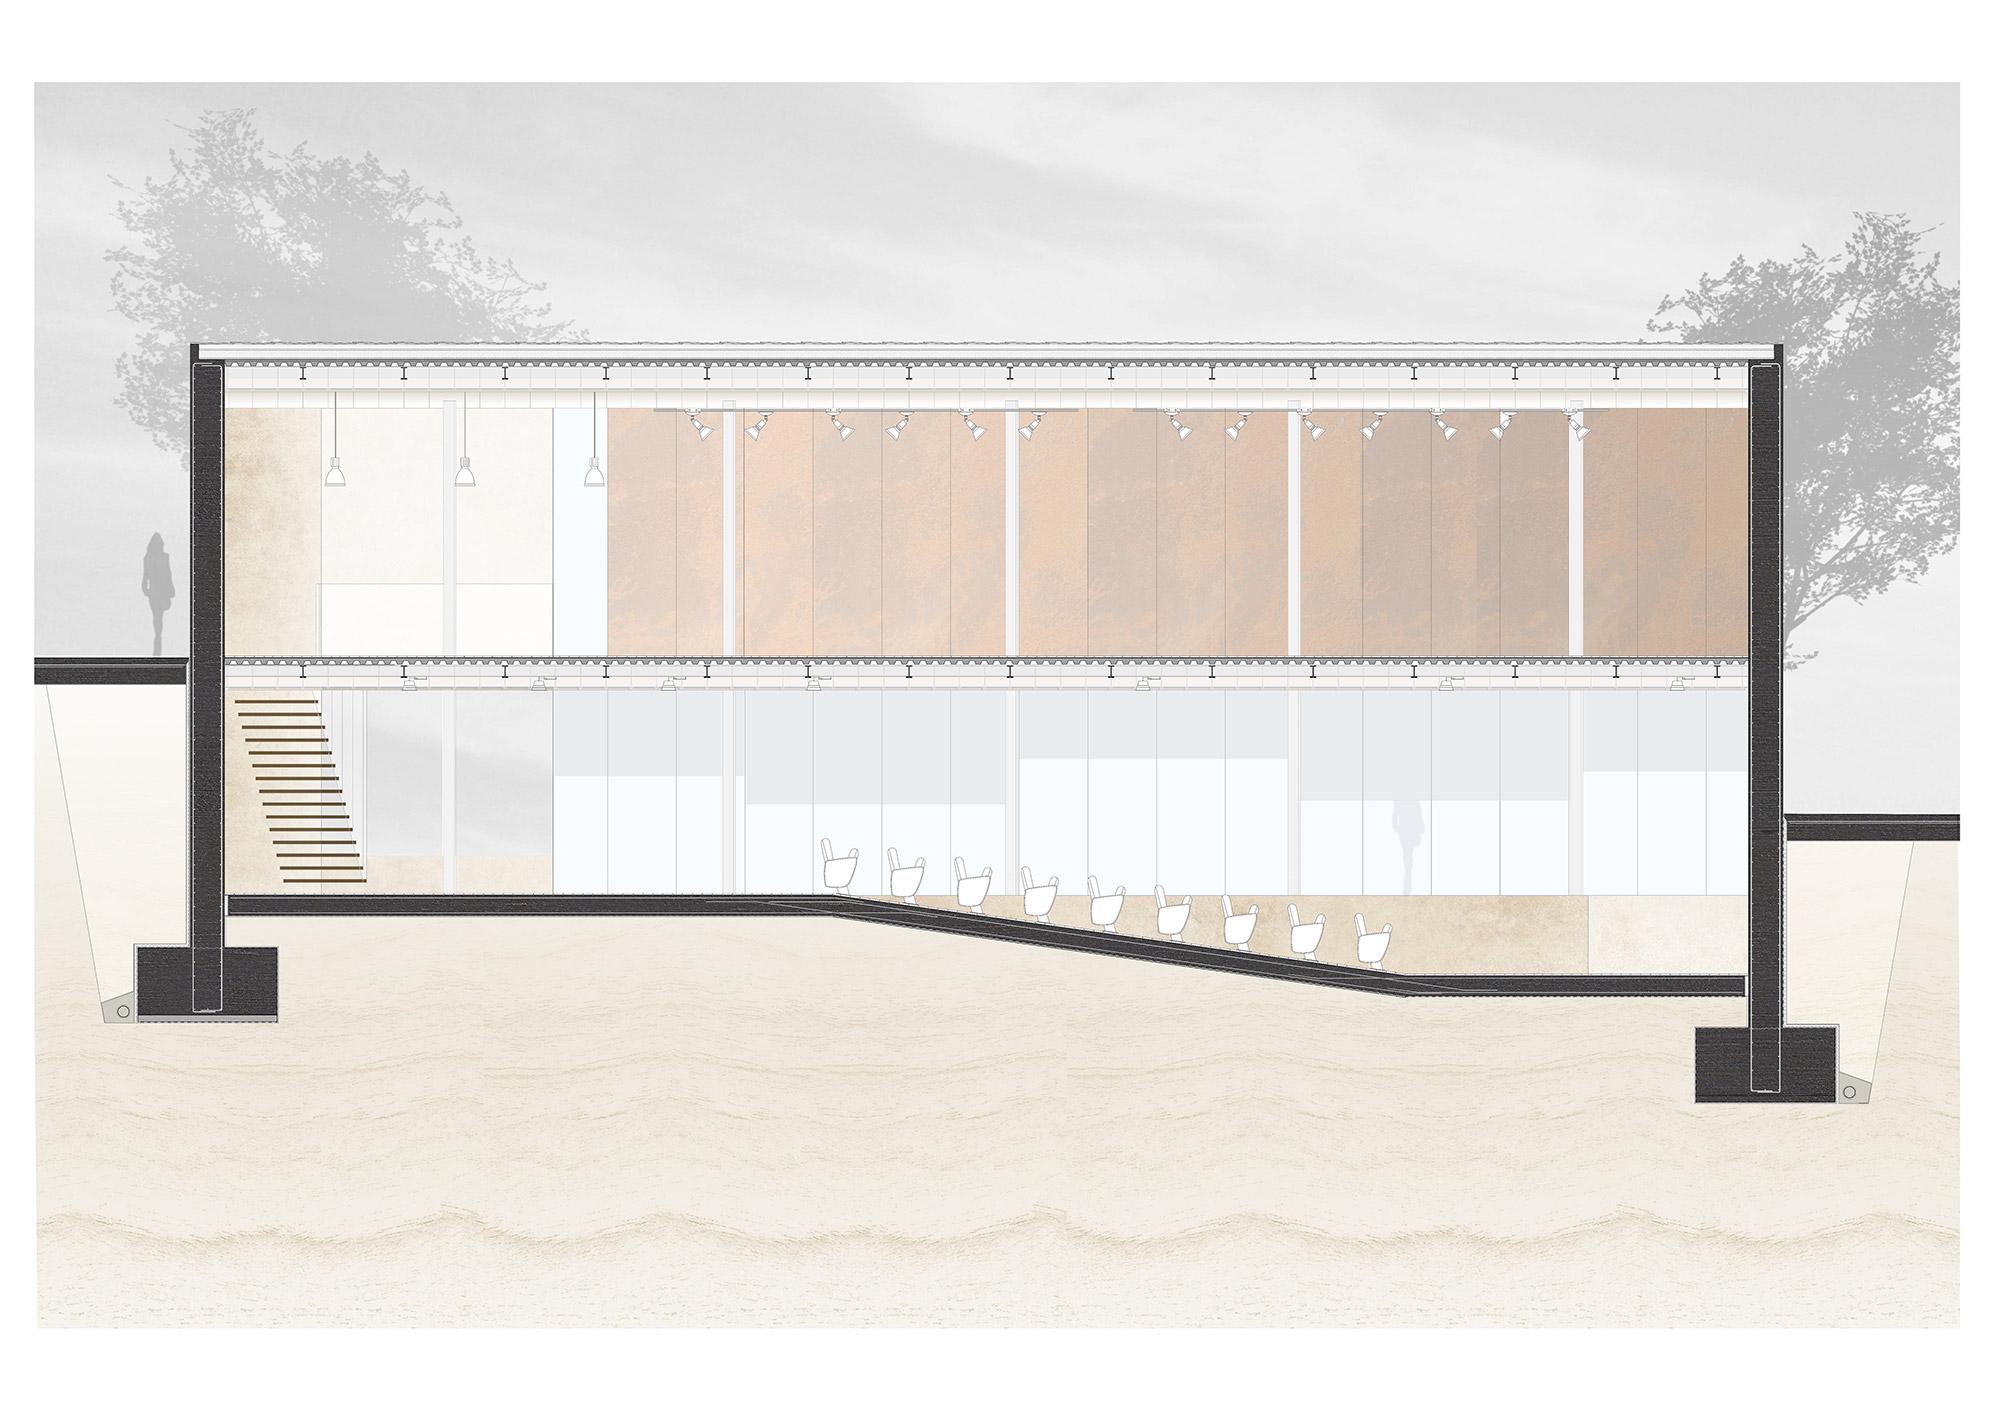 Refugio de monta a arquiayuda ayuda pfc arquitectura - Servicios de arquitectura ...